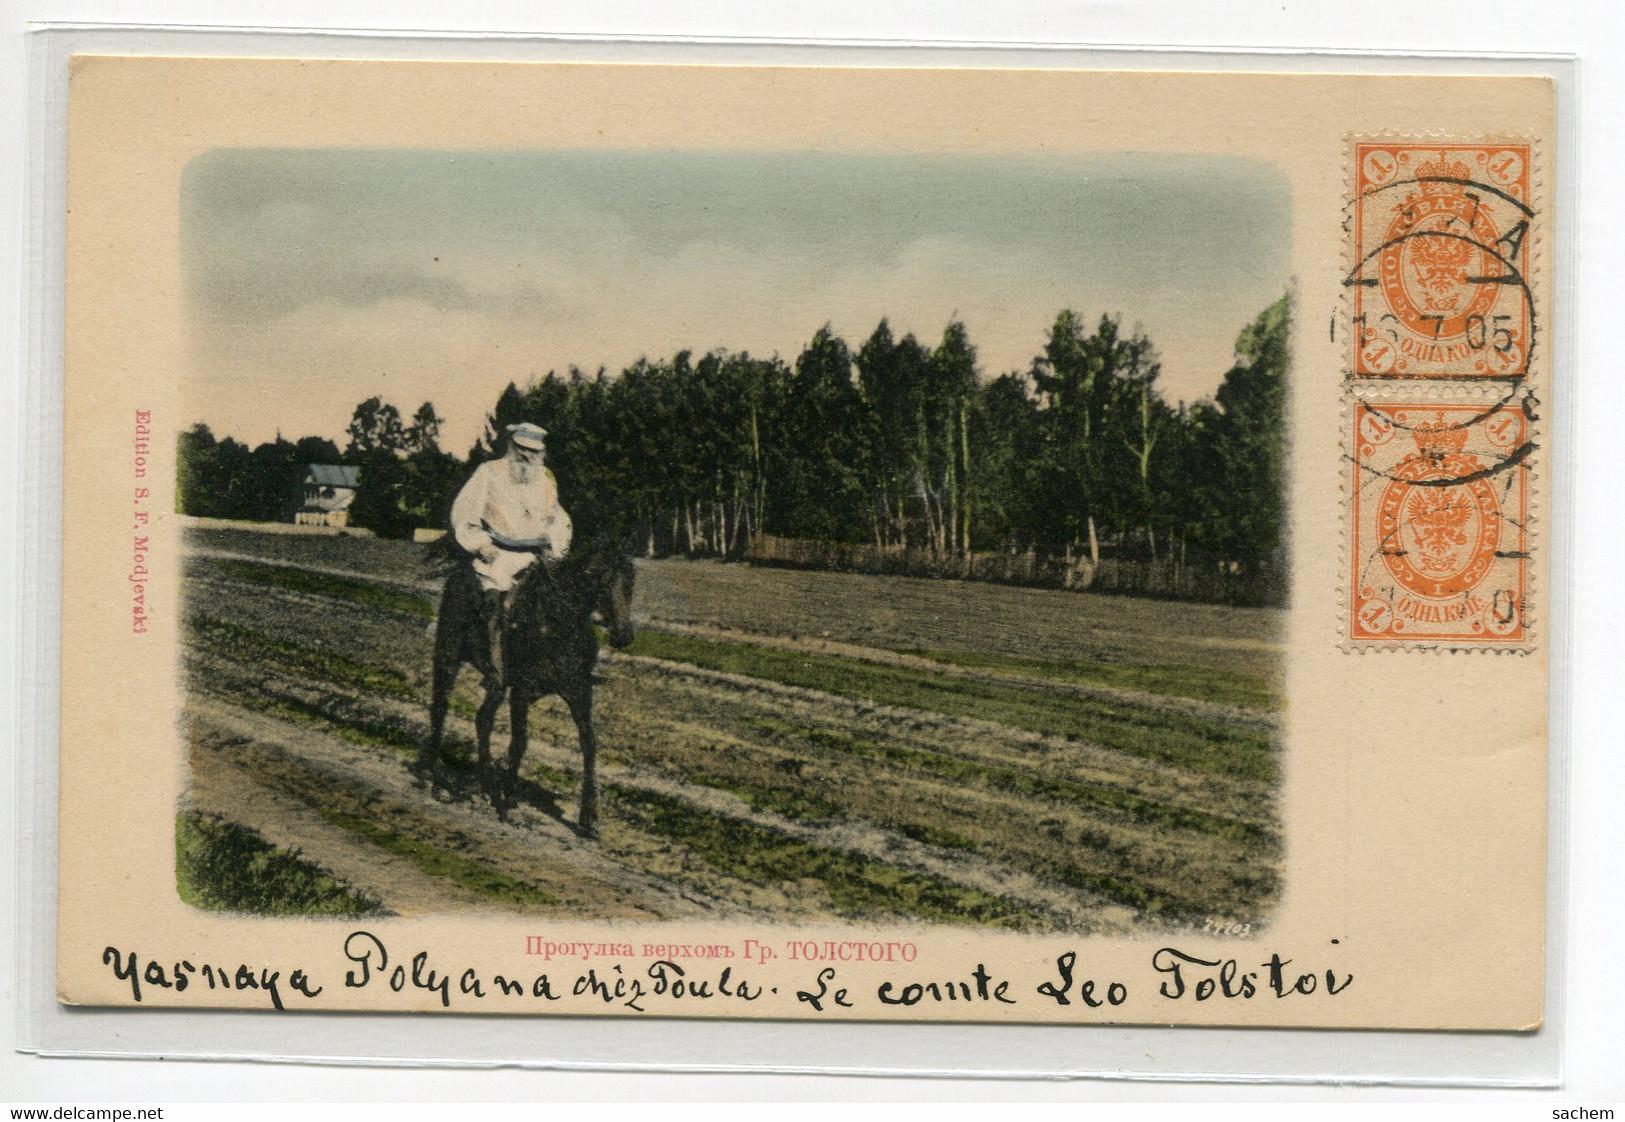 RUSSIE Rare -  Le Comte Leon TOLSTOI à Cheval Campagne  Beau Tirage  Couleur - Edit S.F Modjevski  -1905  /D25-S2018 - Russia